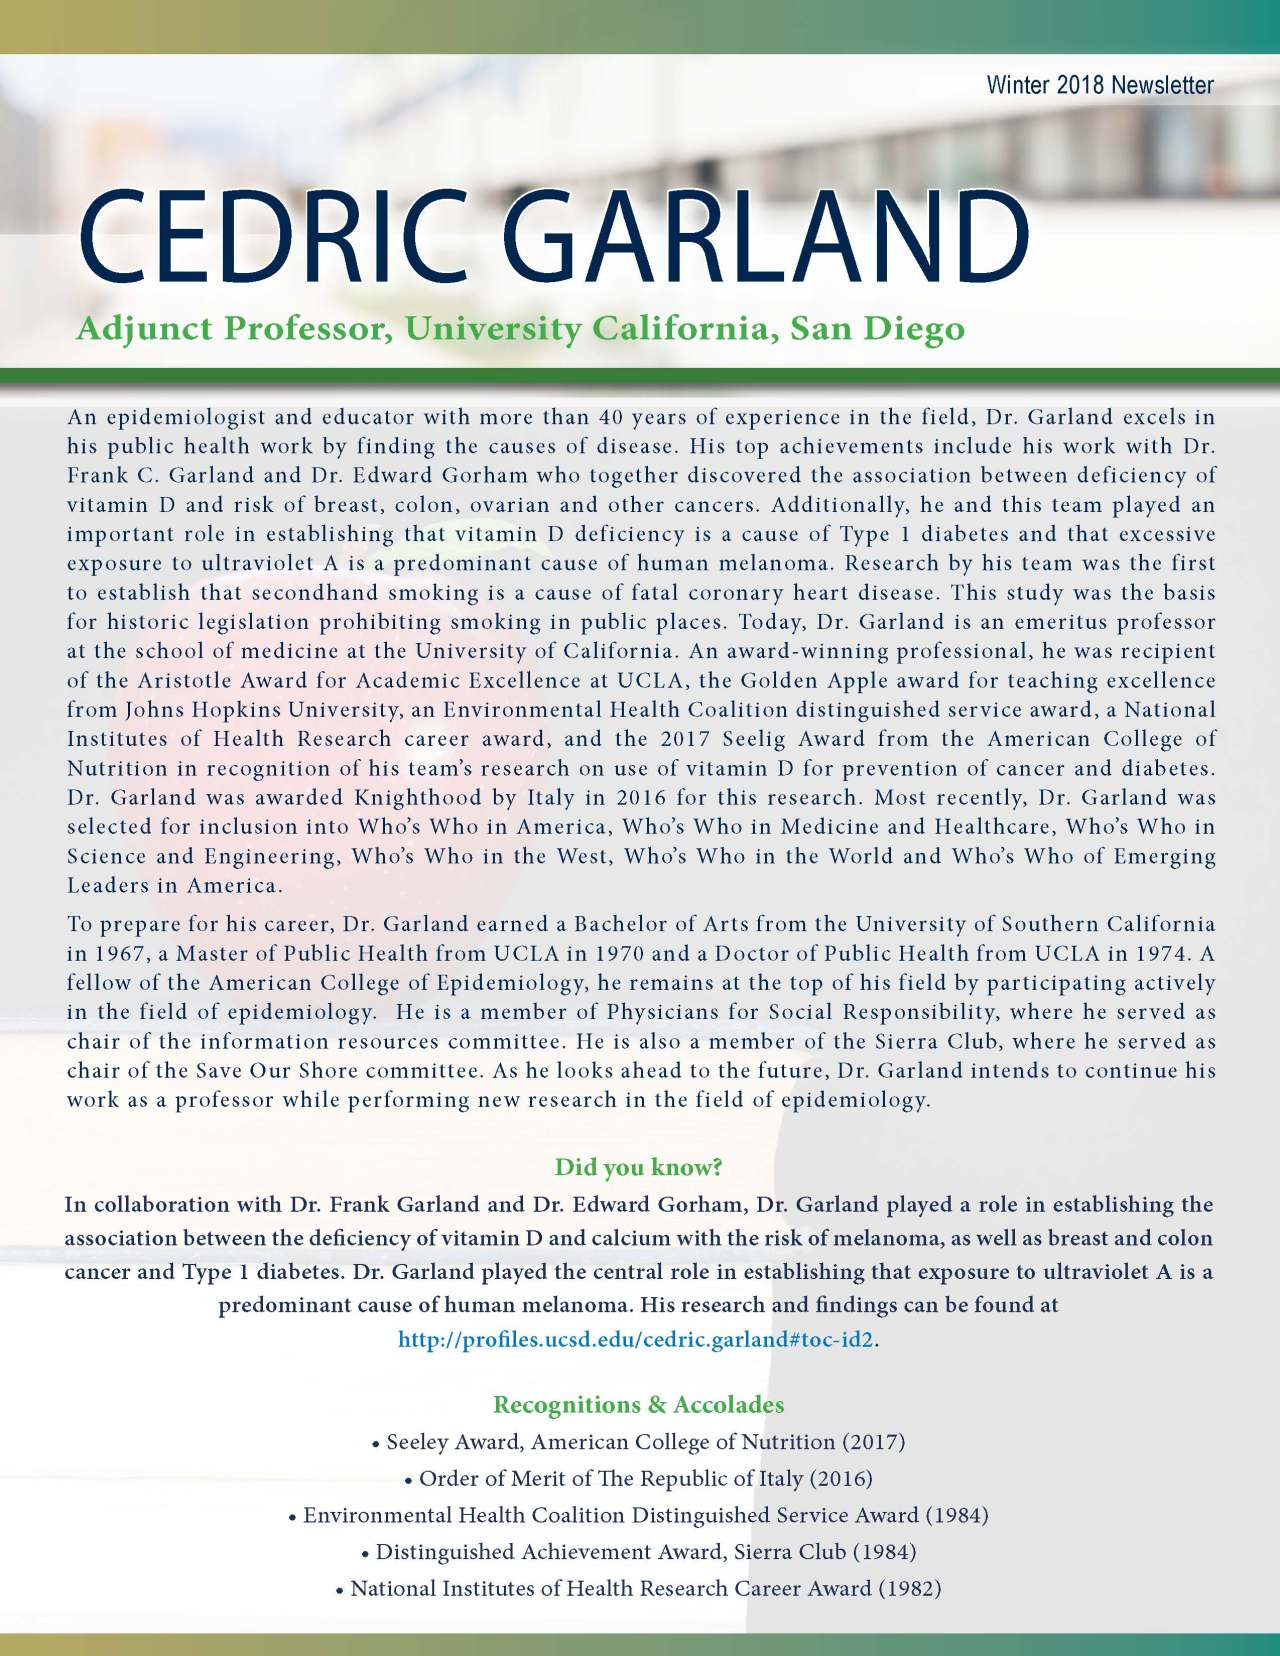 Garland, Cedric 2164270_239196 Newsletter REVISED